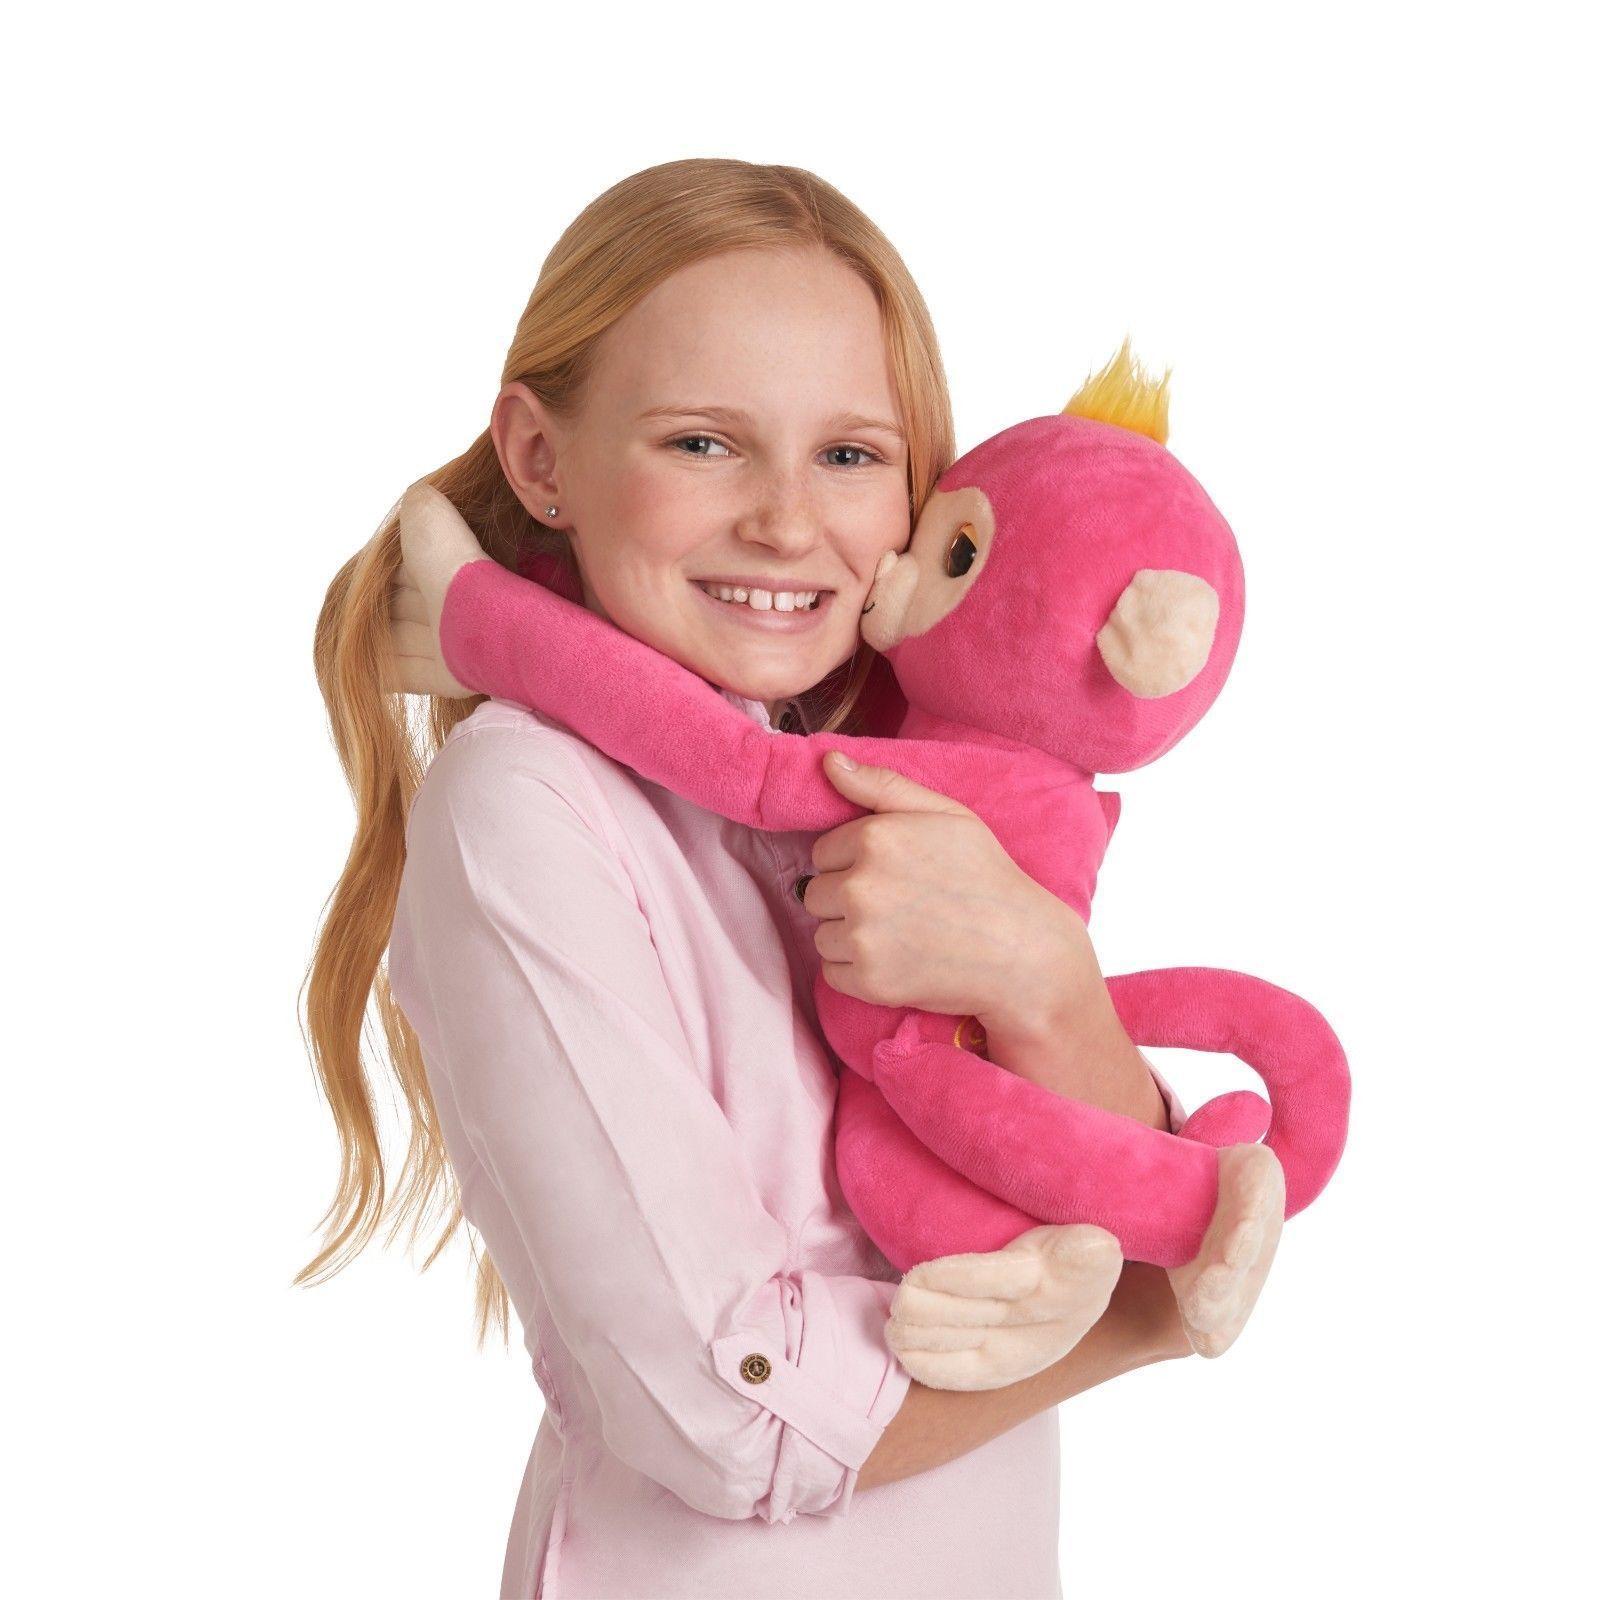 Fingerlings HUGS Bella & Boris Set 2 Advanced Interactive Plush Baby Pets WowWee